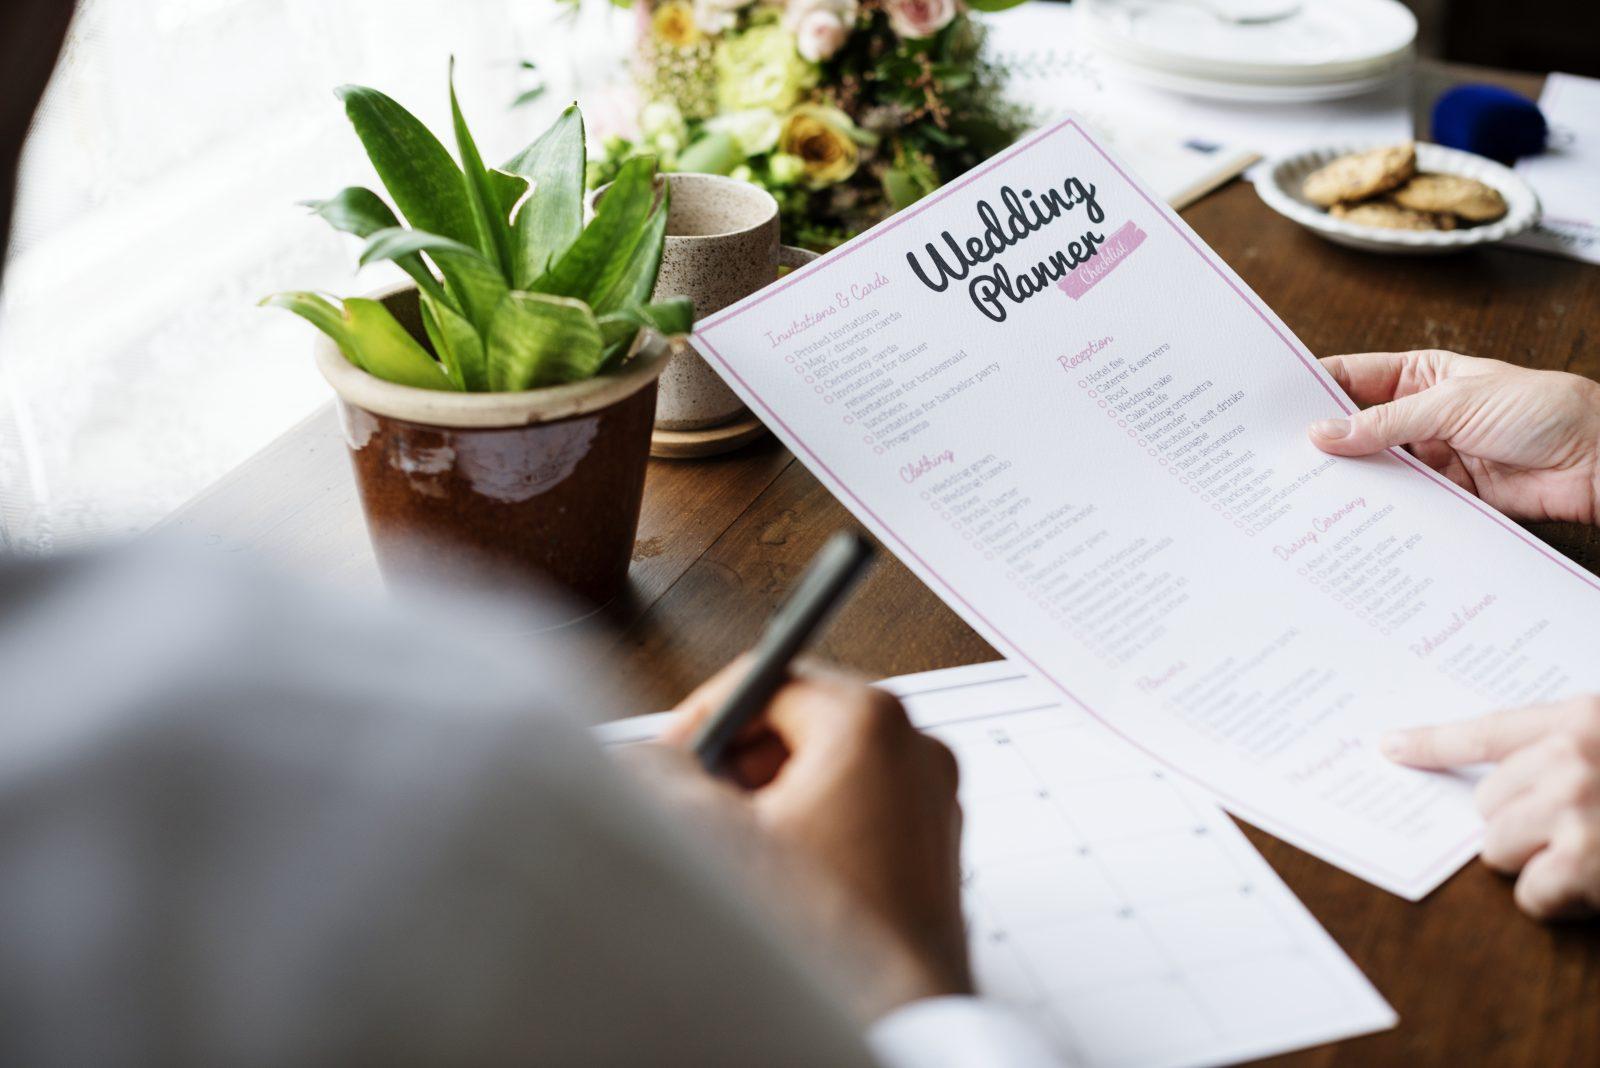 In questa foto un wedding planner tiene in mano una scheda per organizzare un matrimonio